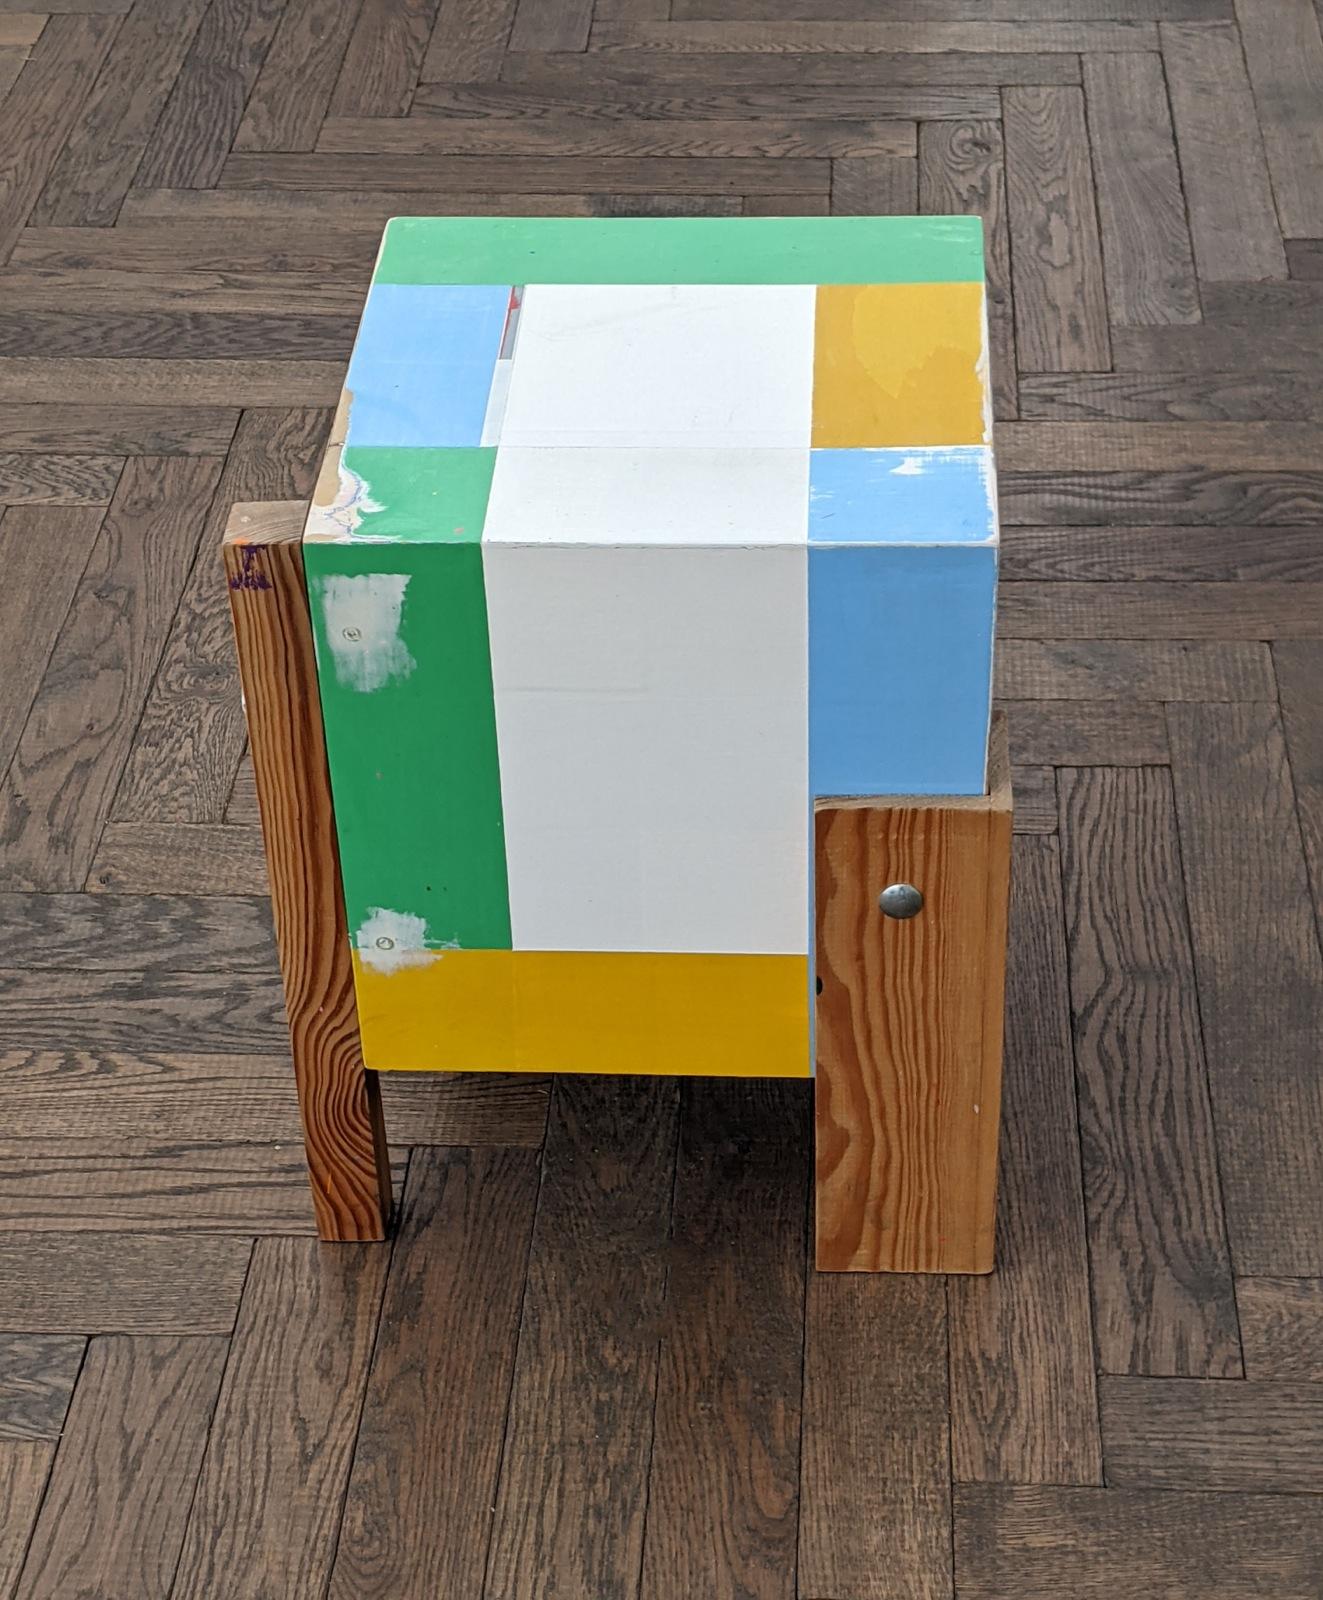 """Stehender Würfel"", 30x30x44 cm, Acrylfarbe, Holz, Metallschrauben, 2011"